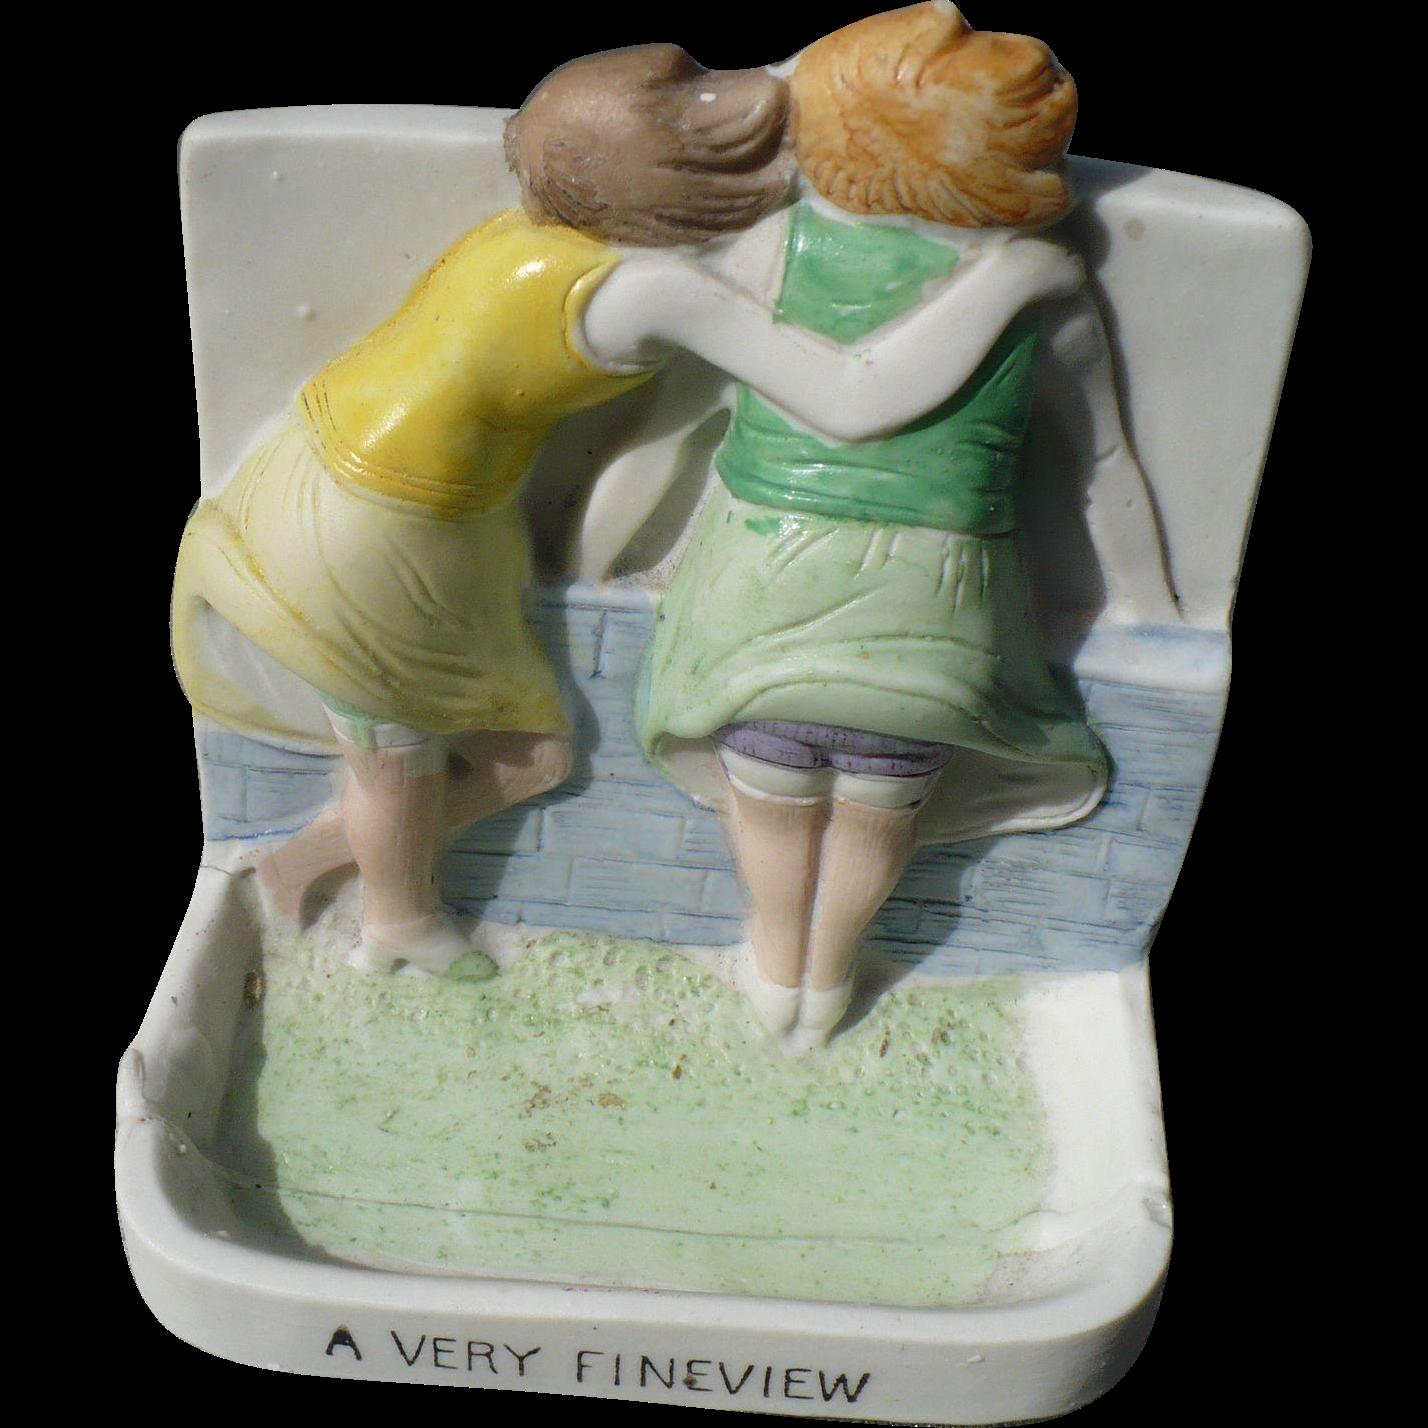 Fine View Ceramic Figurine